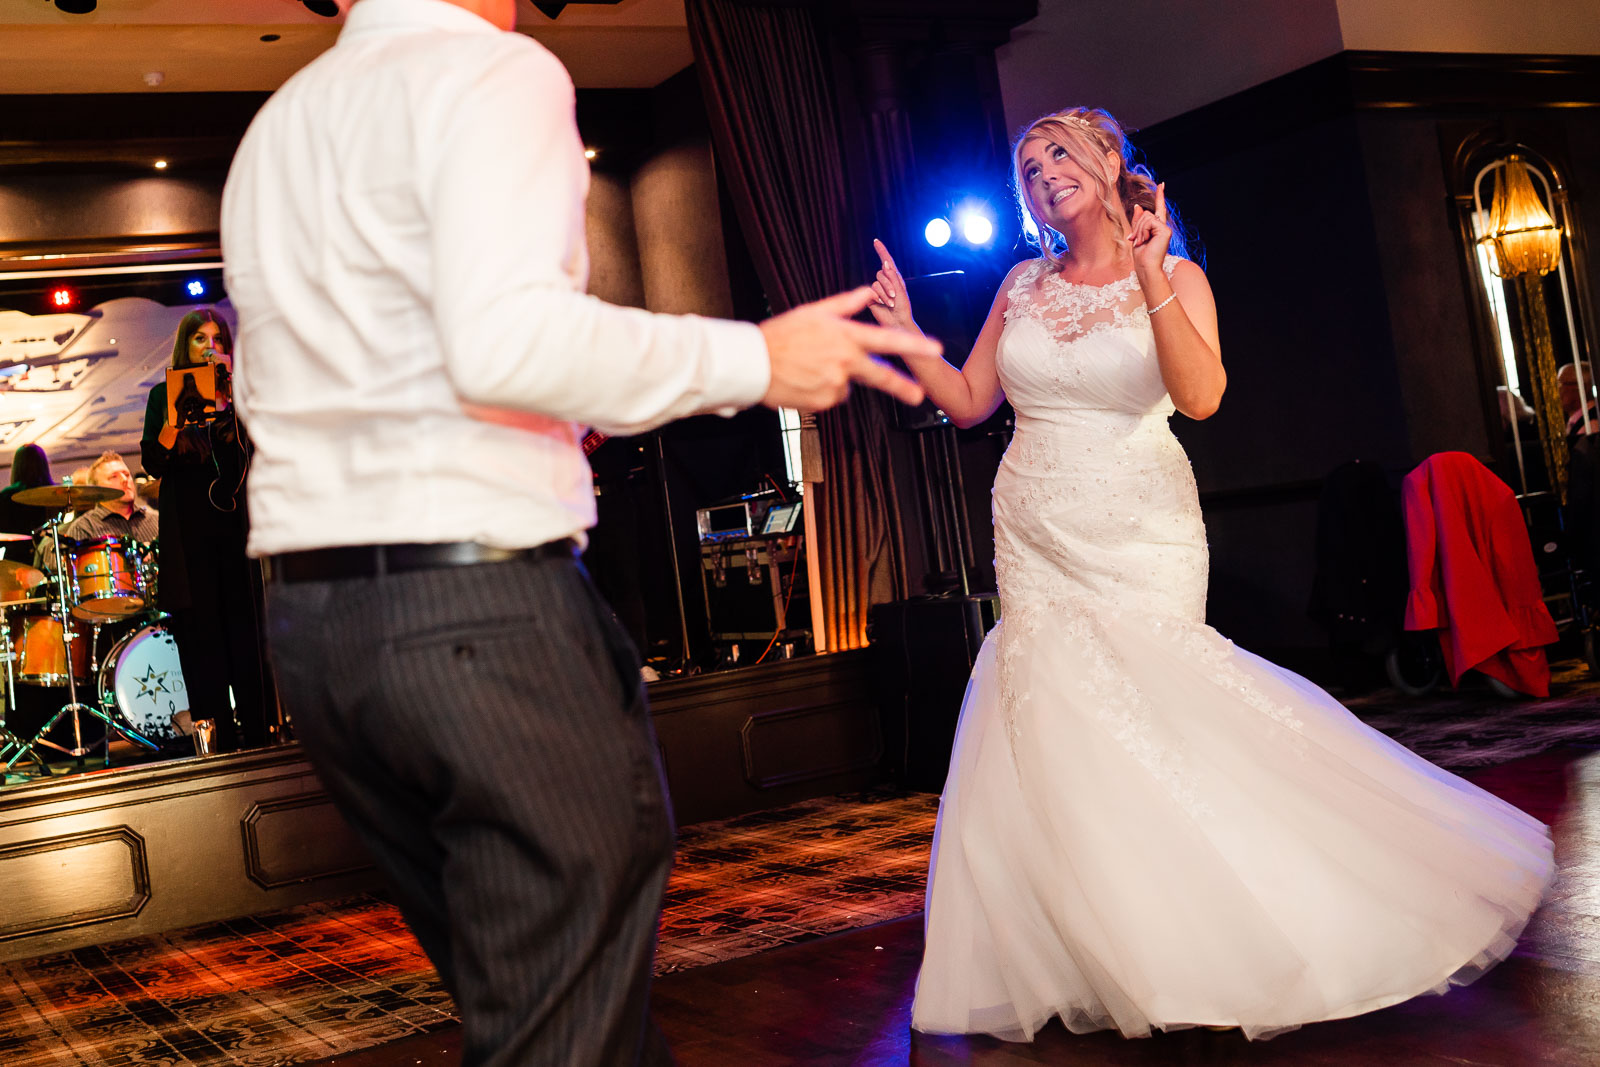 cornhill_castle_wedding_biggar_dearlyphotography (397 of 448).jpg